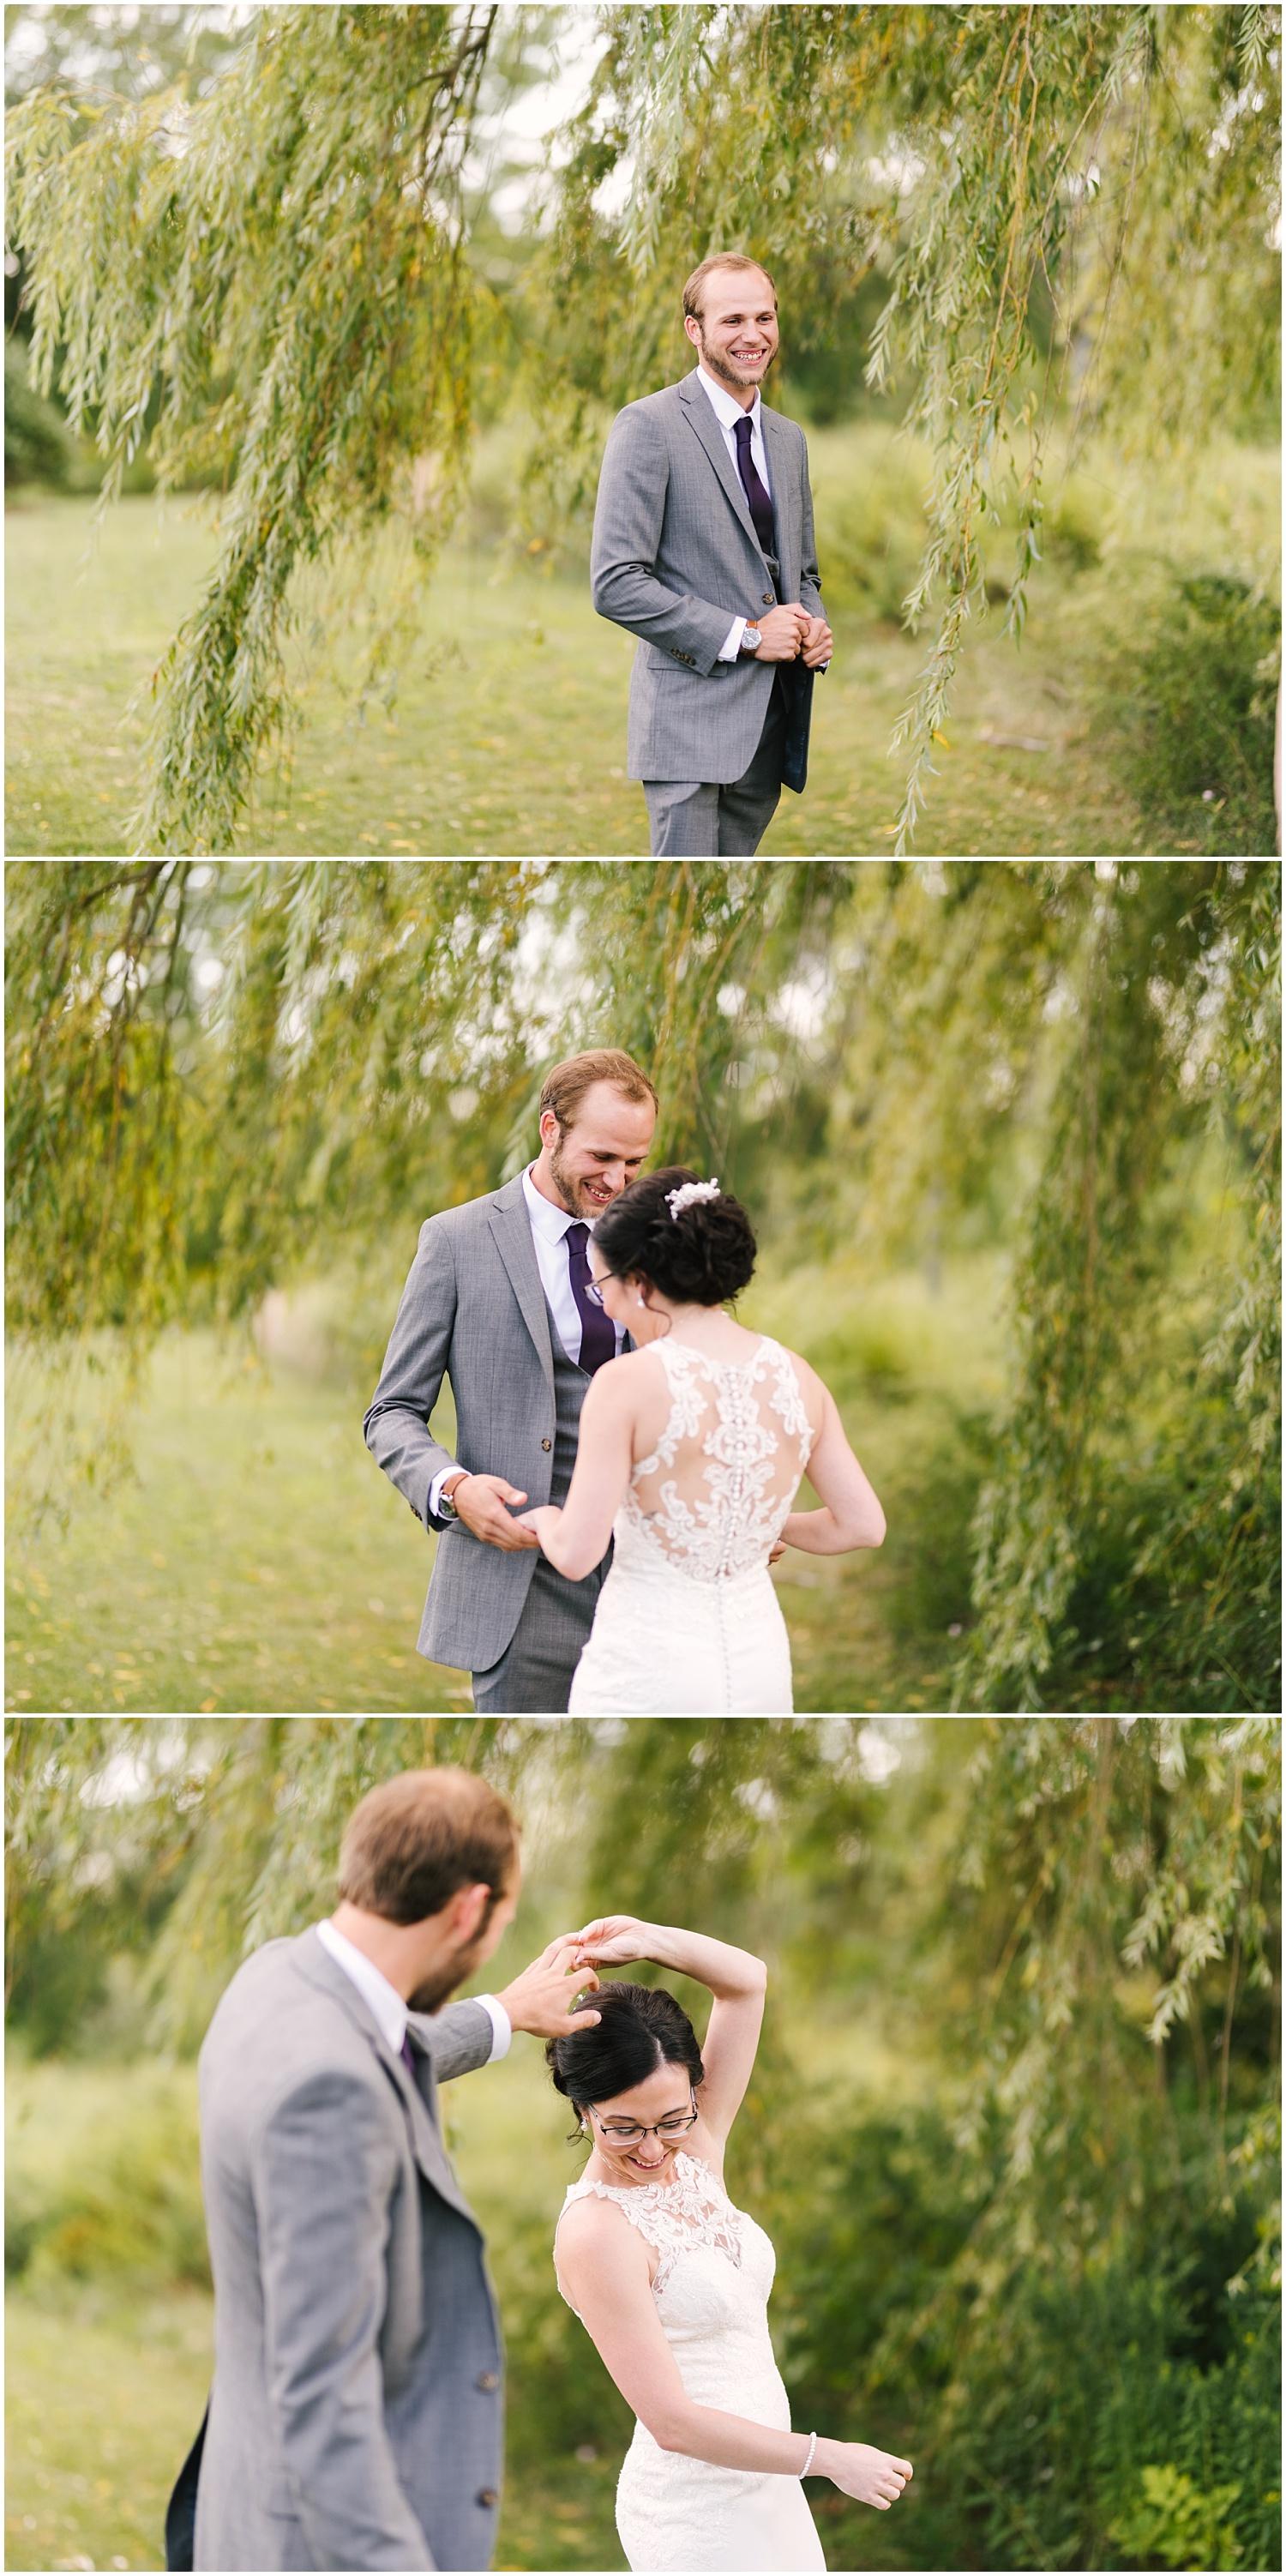 deerfield+country+club+wedding+rochester+NY+photographer (14).jpg